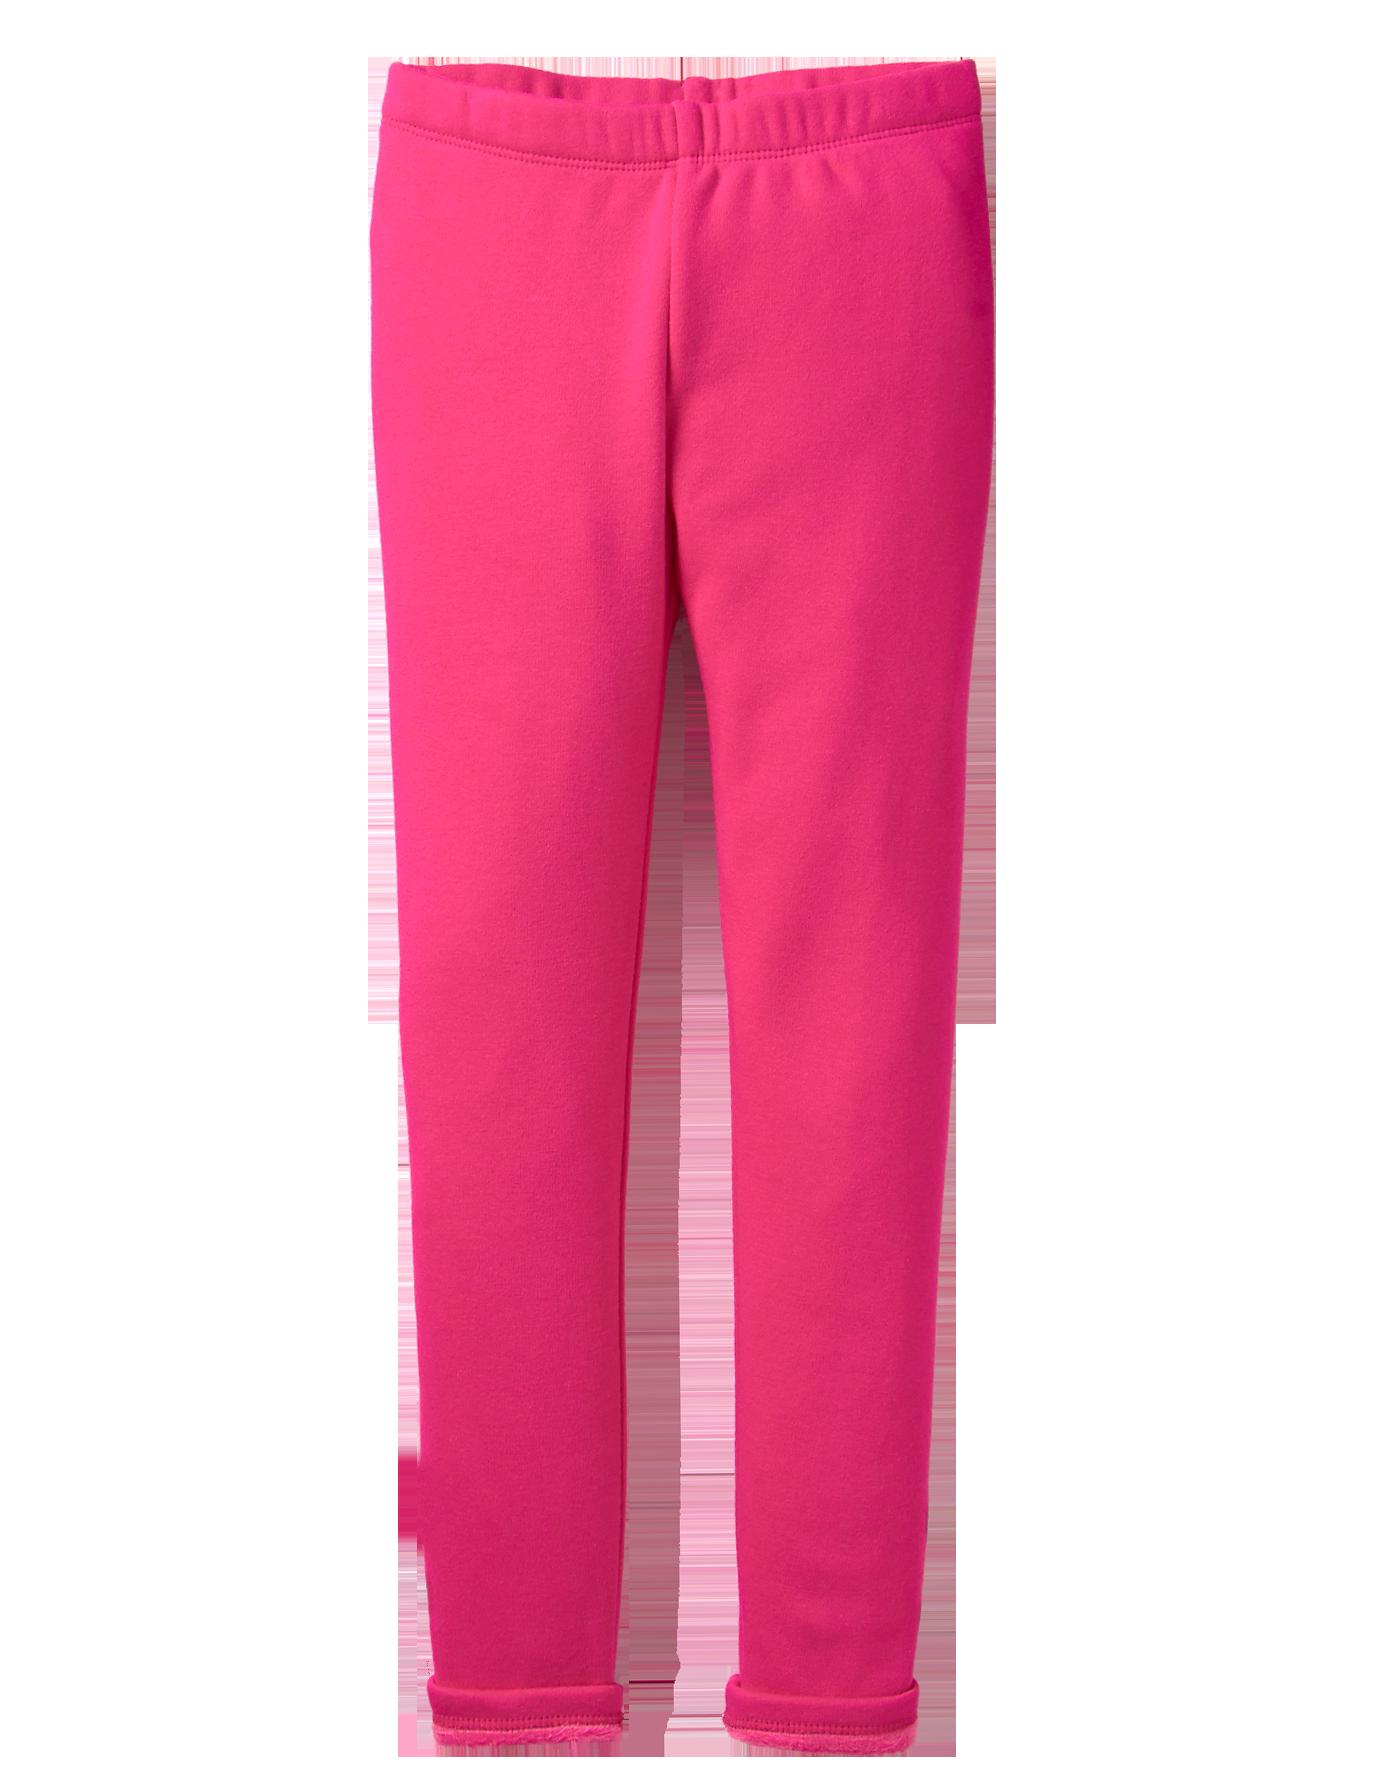 980e11f72c0ad Warm & Fuzzy Leggings; Gymboree, $8 sale | Abby Style Now | Gymboree ...